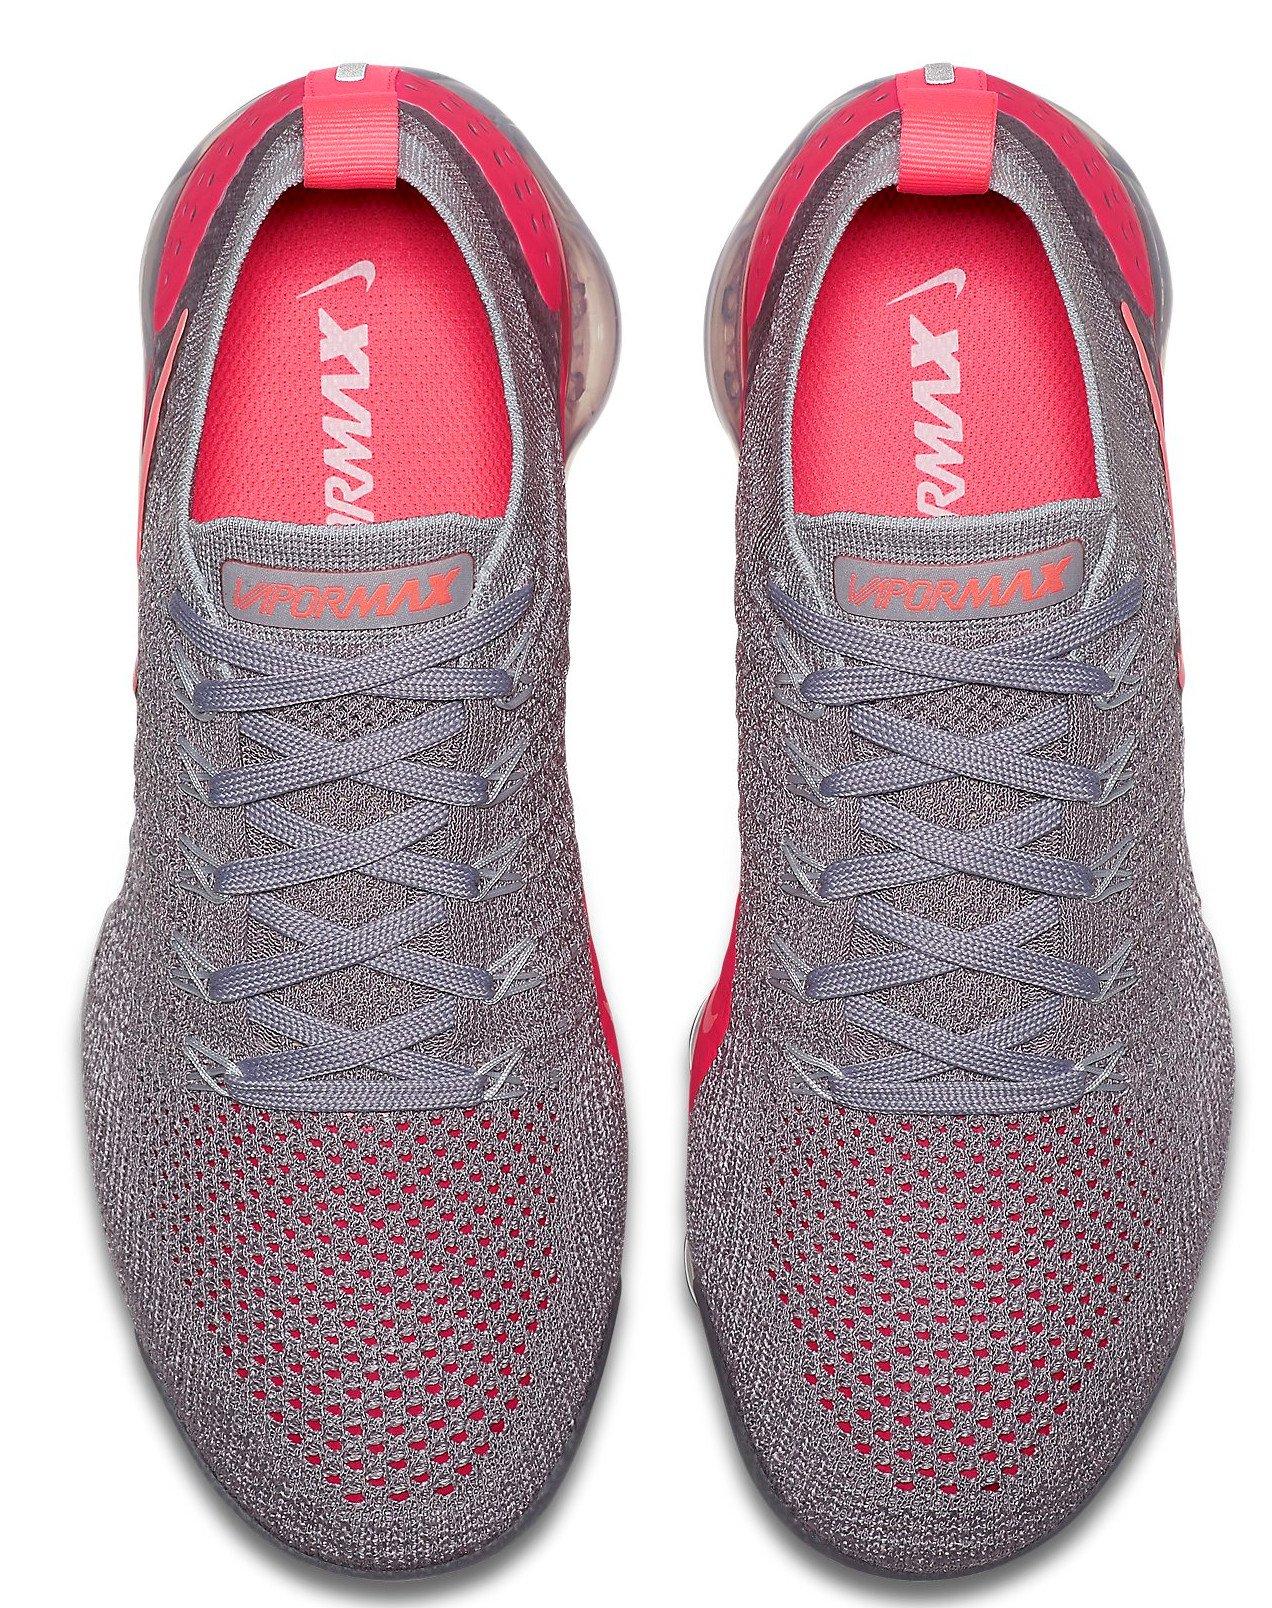 ermax chaussure nike